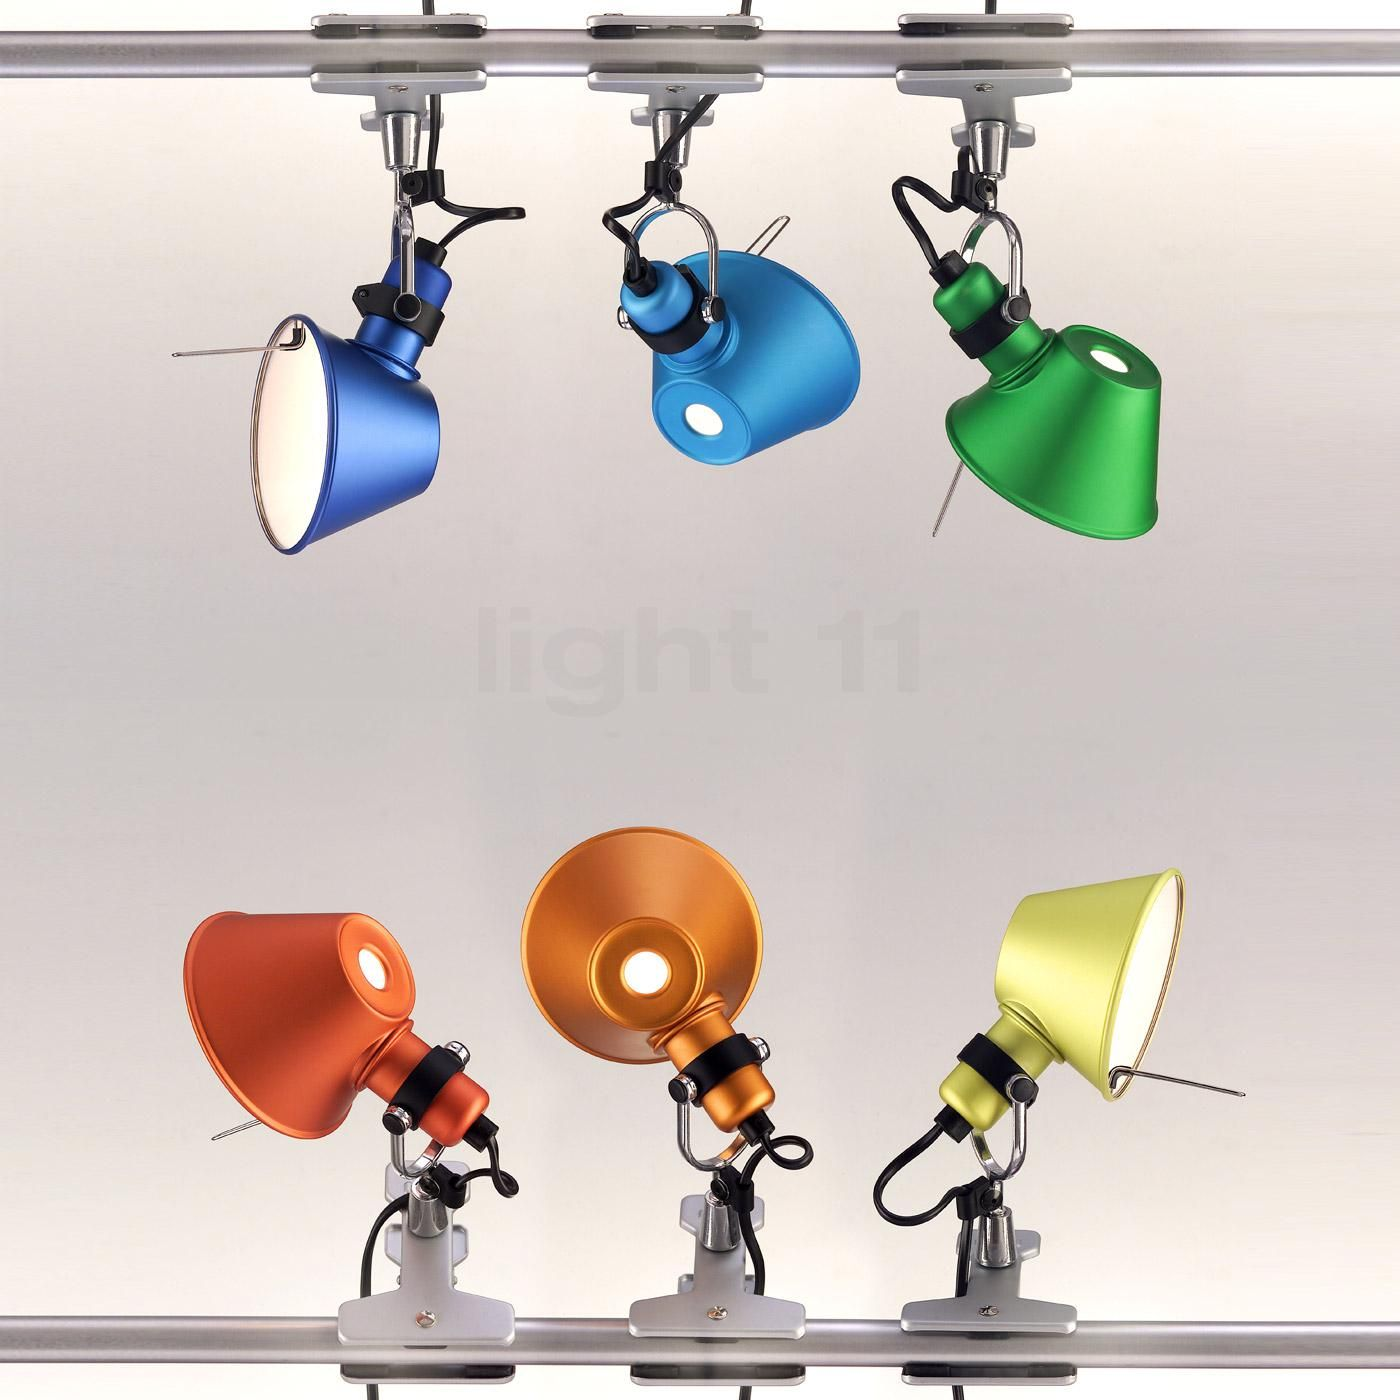 Tolomeo Micro Table Lamp Black By Artemide Black Table Lamps Office Lamp Design Lamp